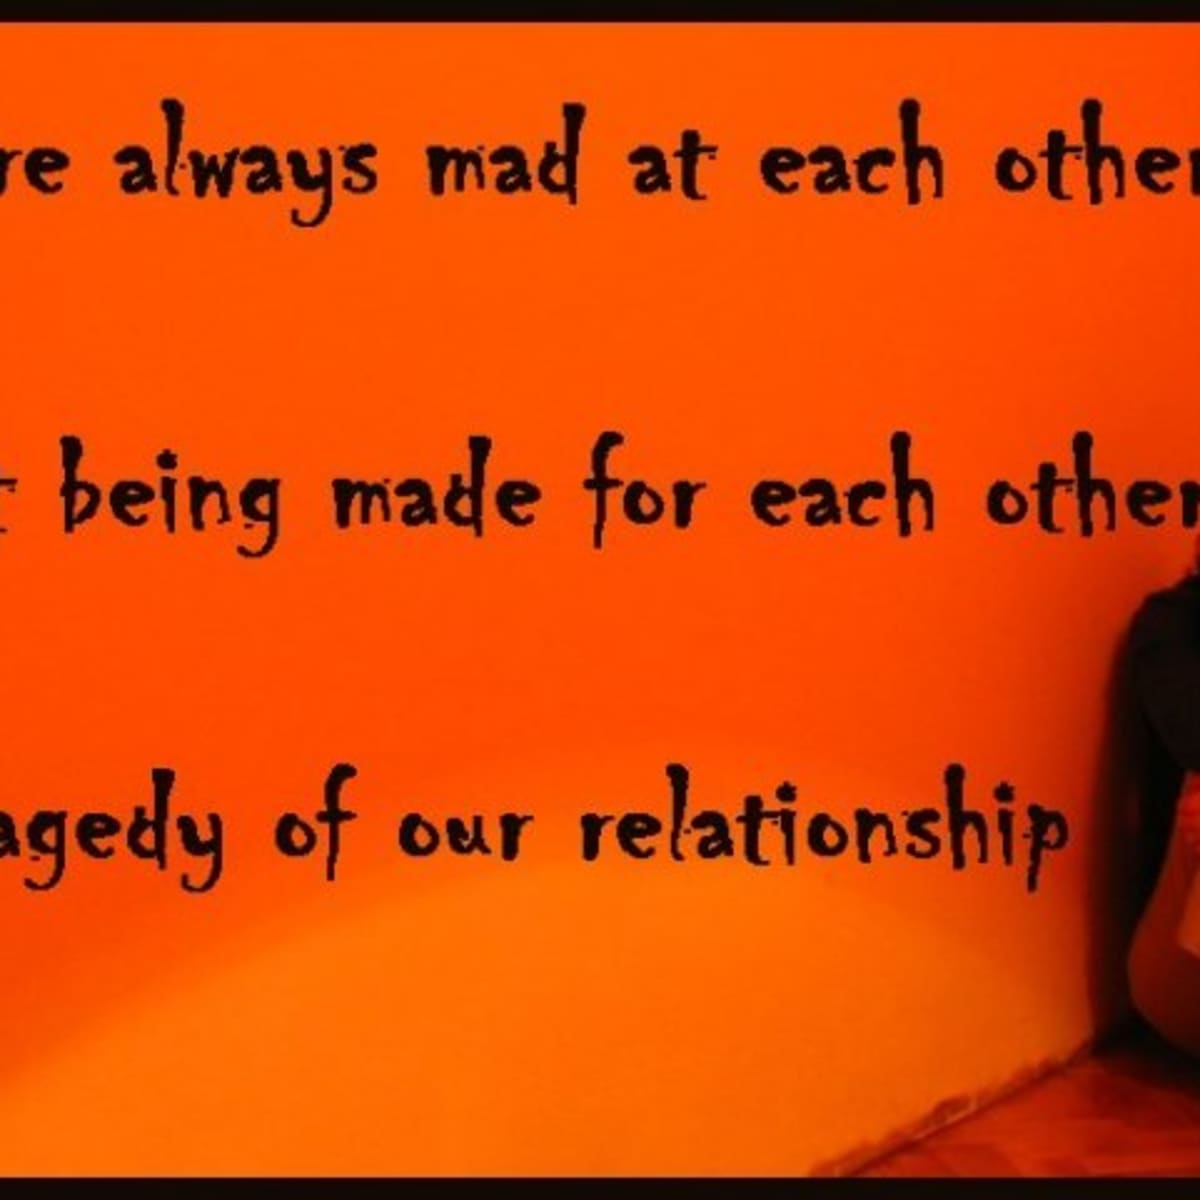 Status sad relationship Tu Agar